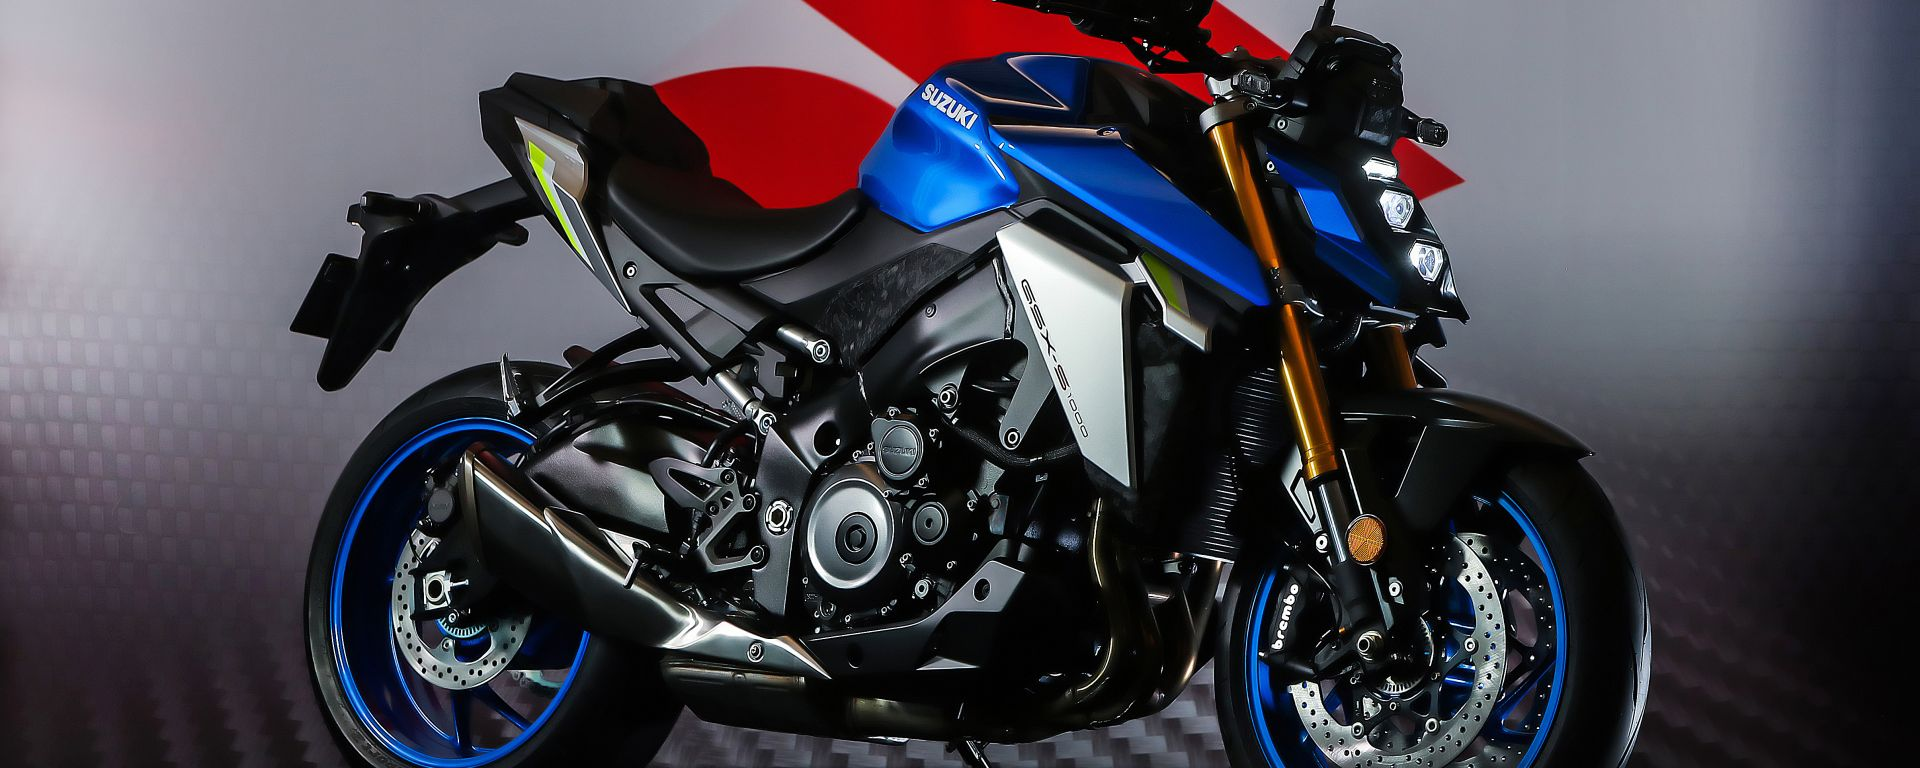 Suzuki svela la nuova GSX-S1000 2021: il video